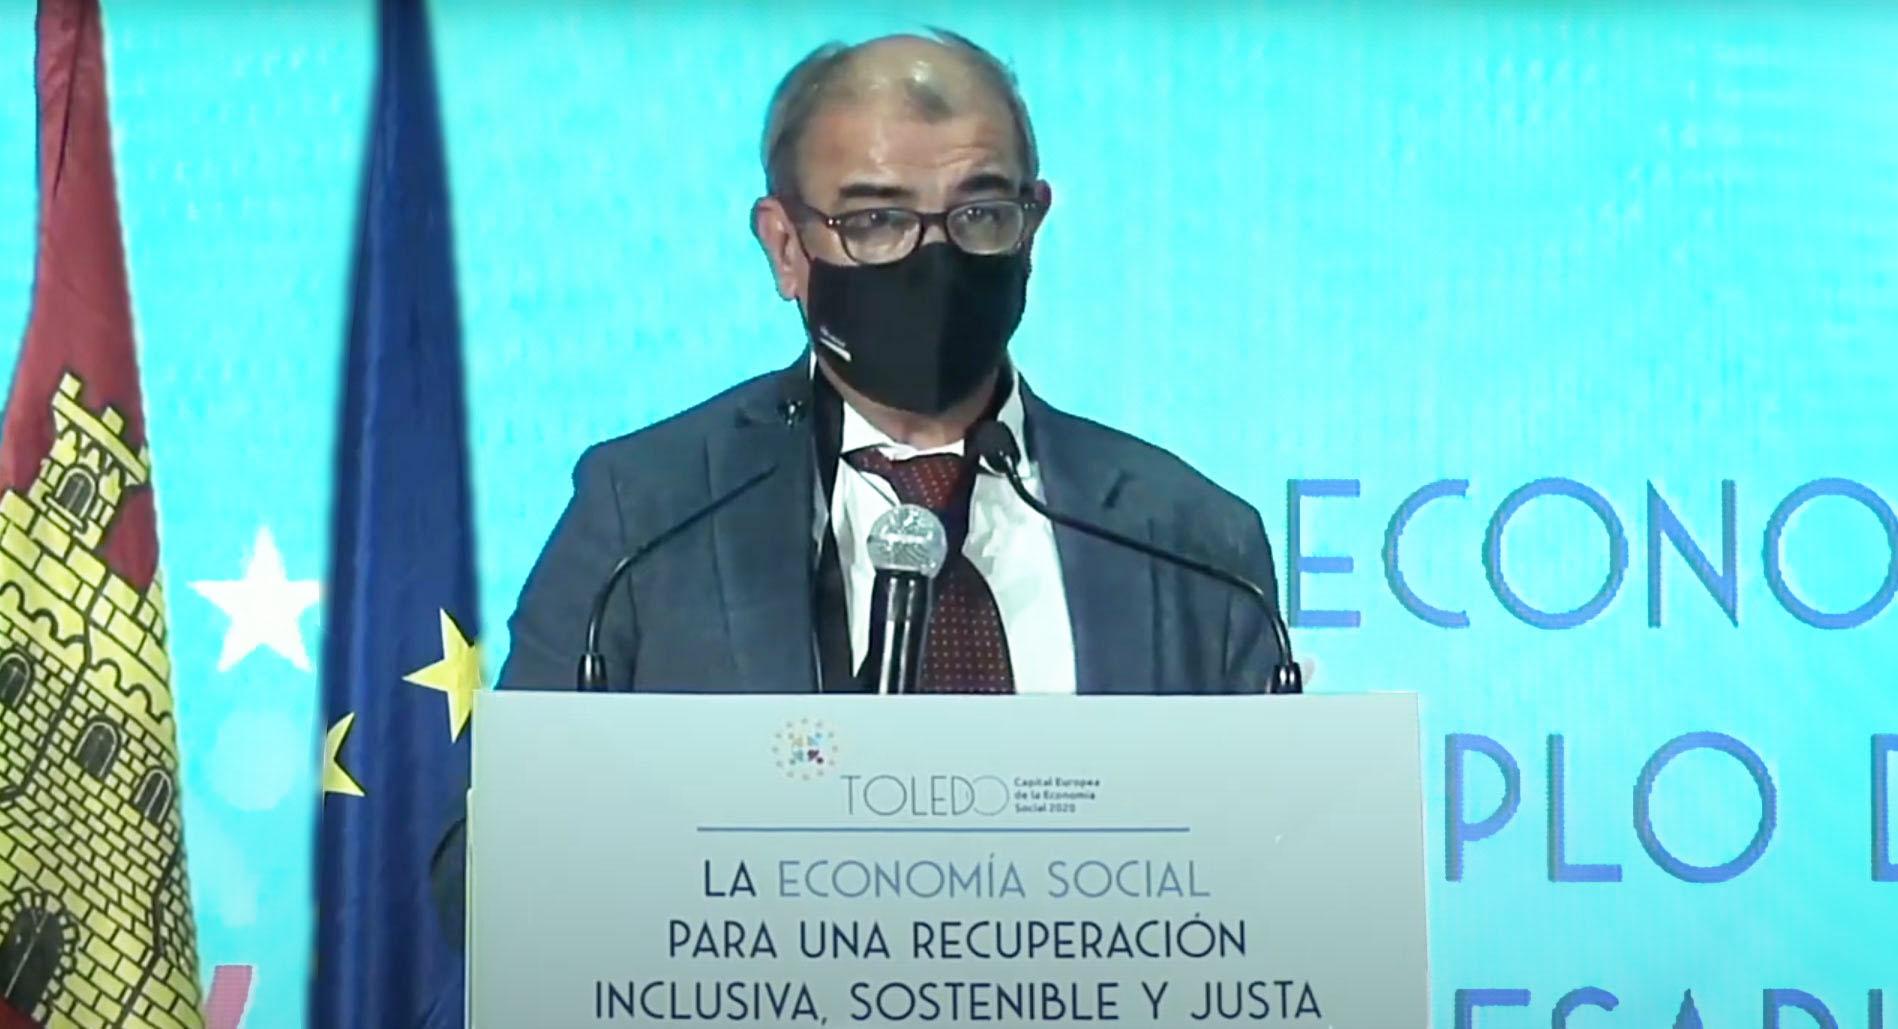 Cumbre Internacional 4 de noviembre, Toledo 2020